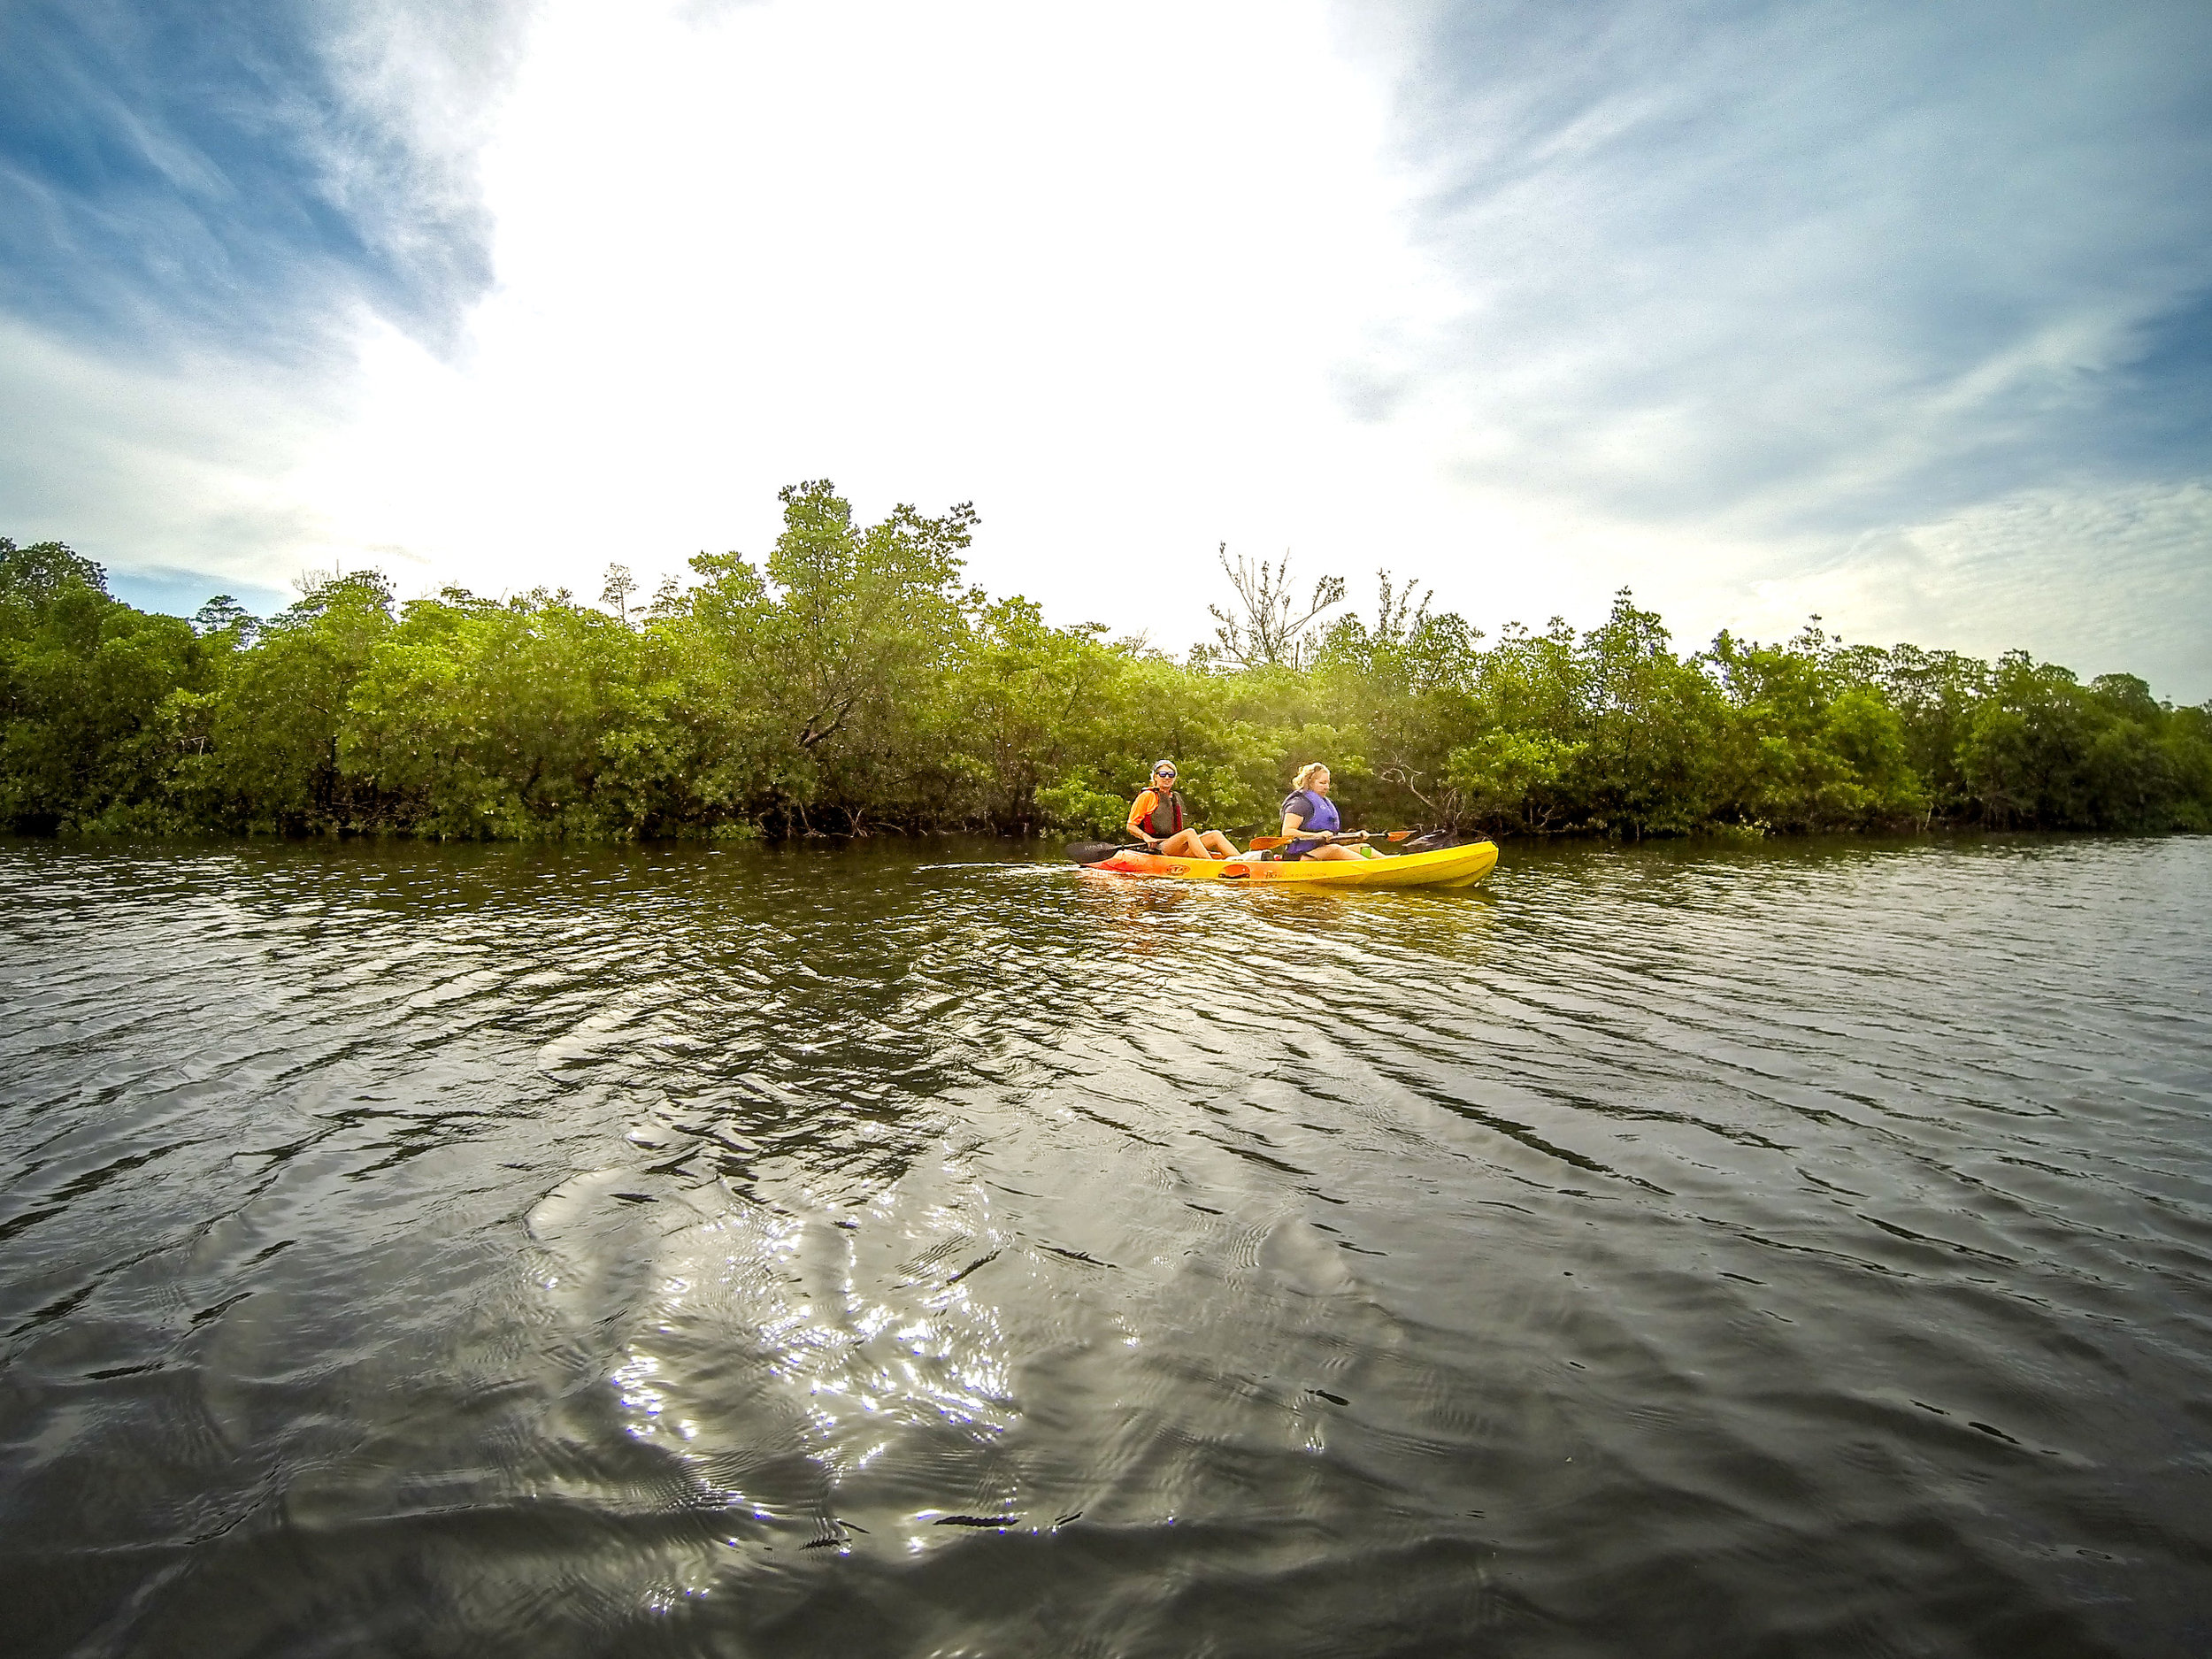 ola-pi-creative-finding-mindfulness-water-kayak